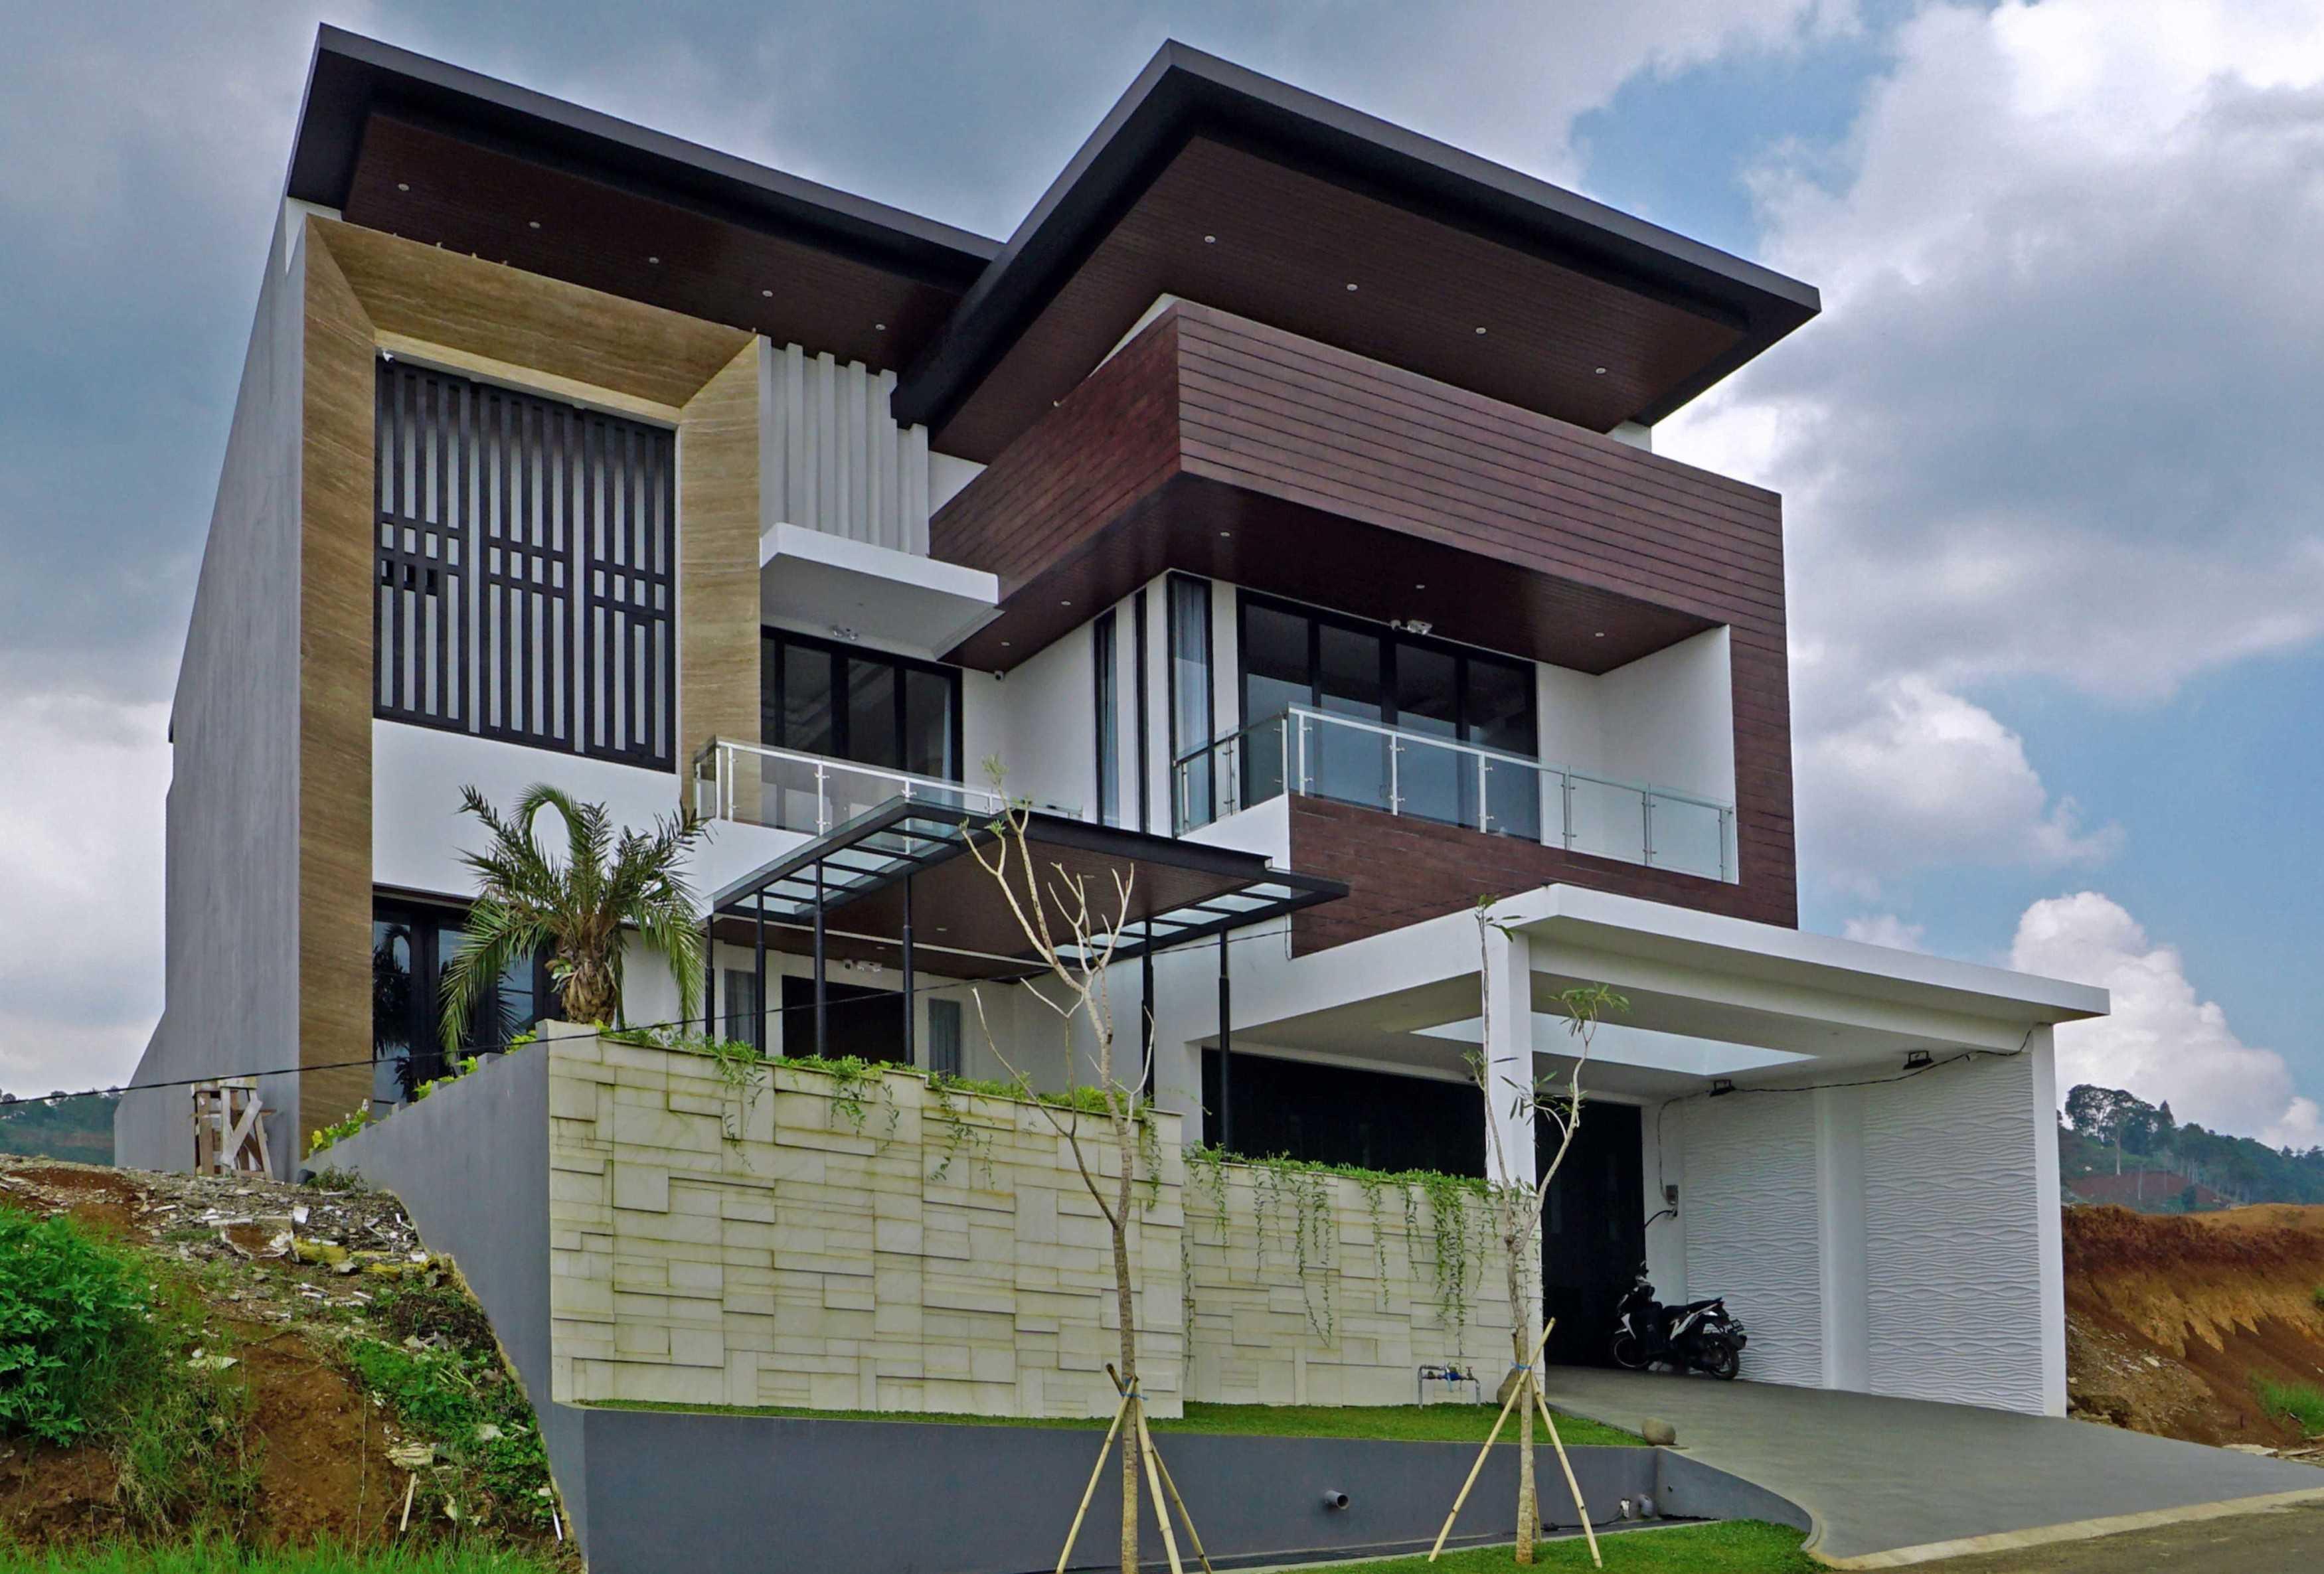 Emporio Architect Hasil Konstruksi Rumah Modern Tropis 363 @ Bandung Bandung, Kota Bandung, Jawa Barat, Indonesia Bandung, Kota Bandung, Jawa Barat, Indonesia Emporio-Architect-Hasil-Konstruksi-Rumah-Modern-Tropis-363-Bandung   82731